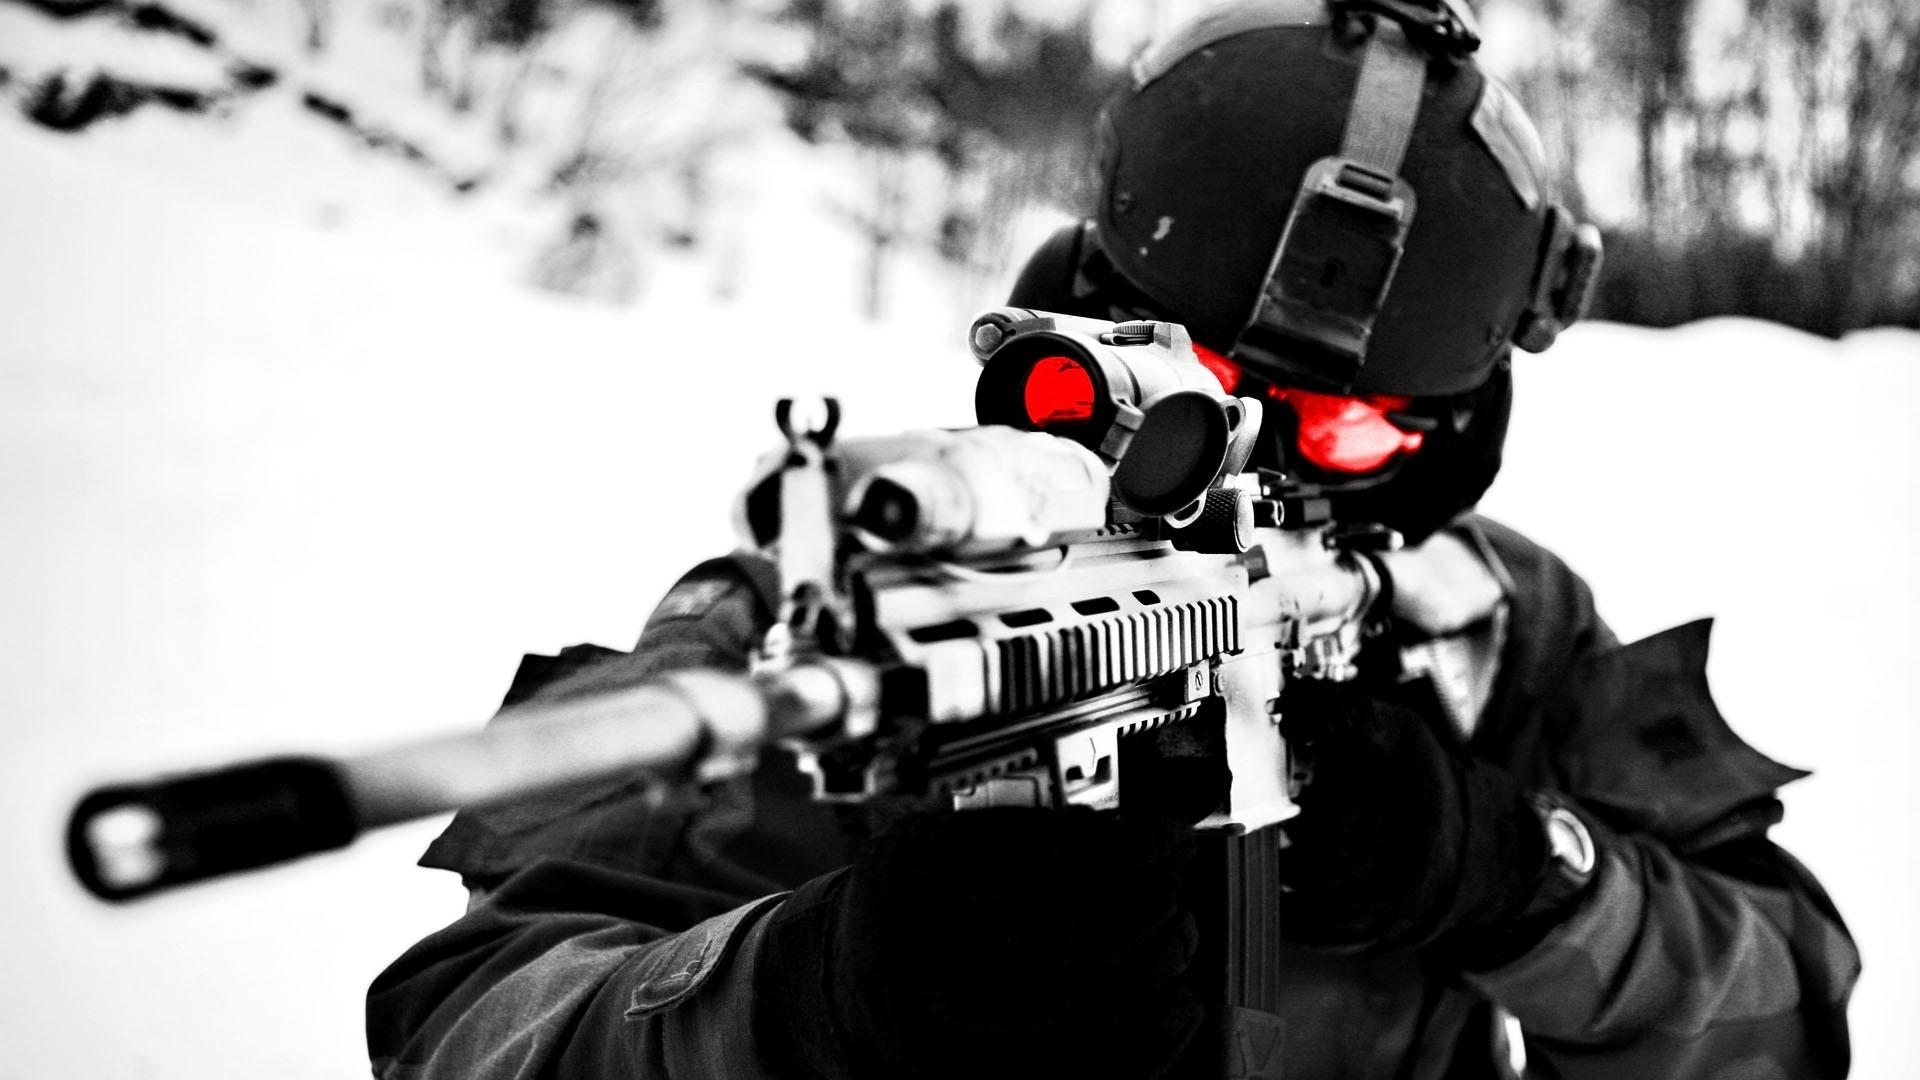 special forces wallapper, спецназ, обои для рабочего стола